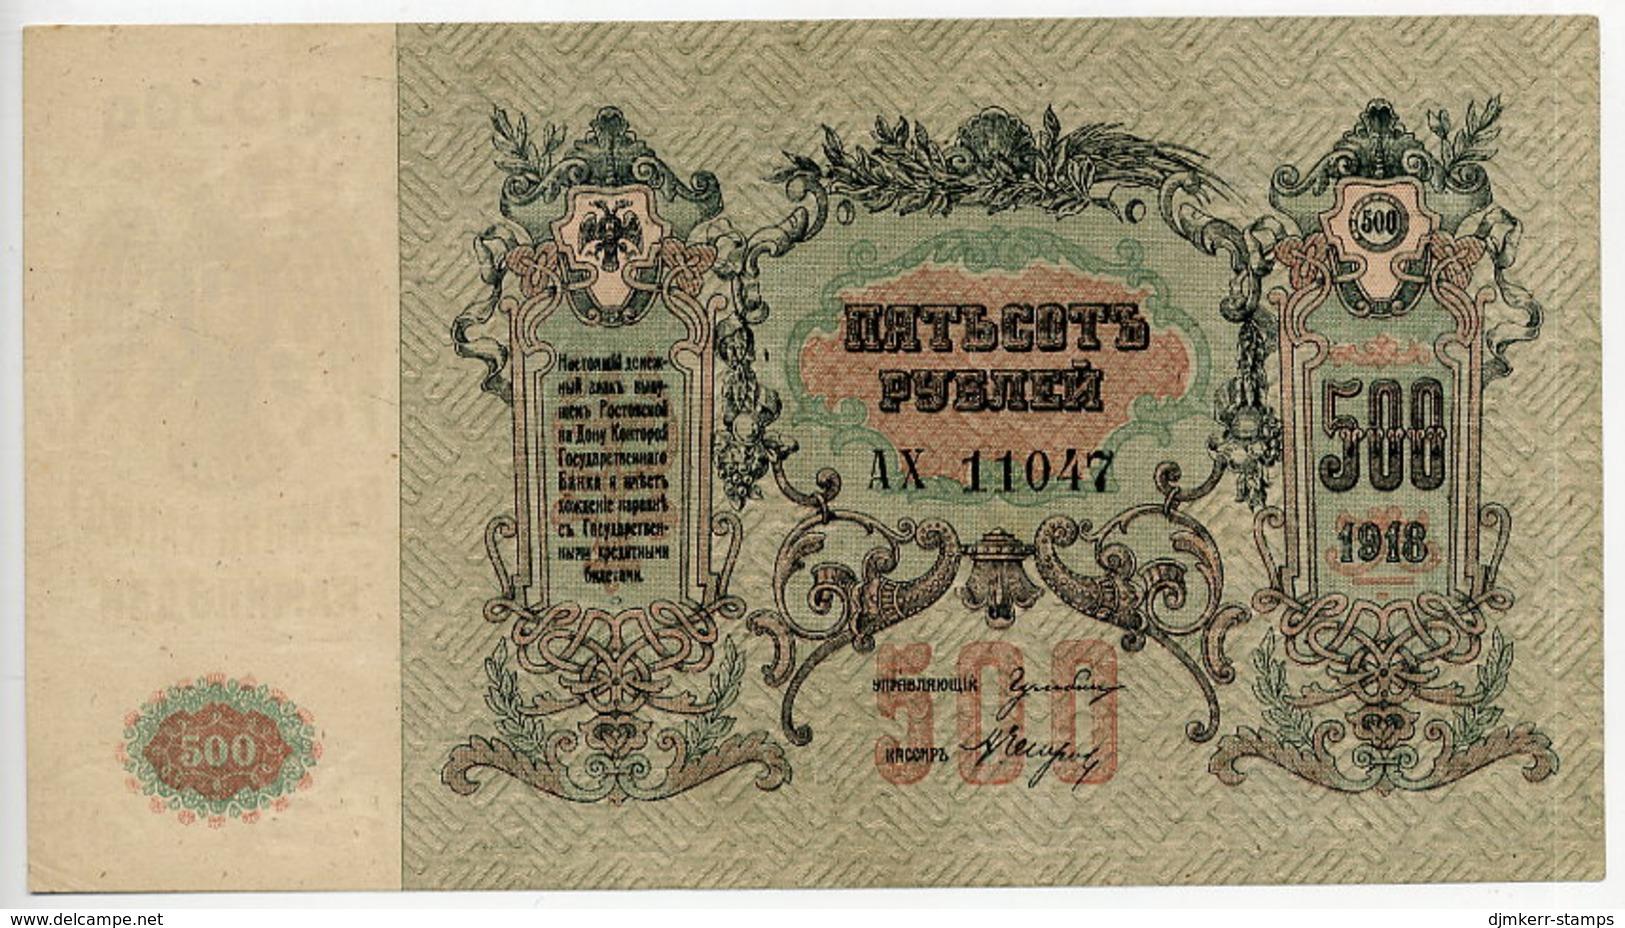 SOUTH RUSSIA 1918  500 Rubles VF  S415c (monogram Watermark) - Russia